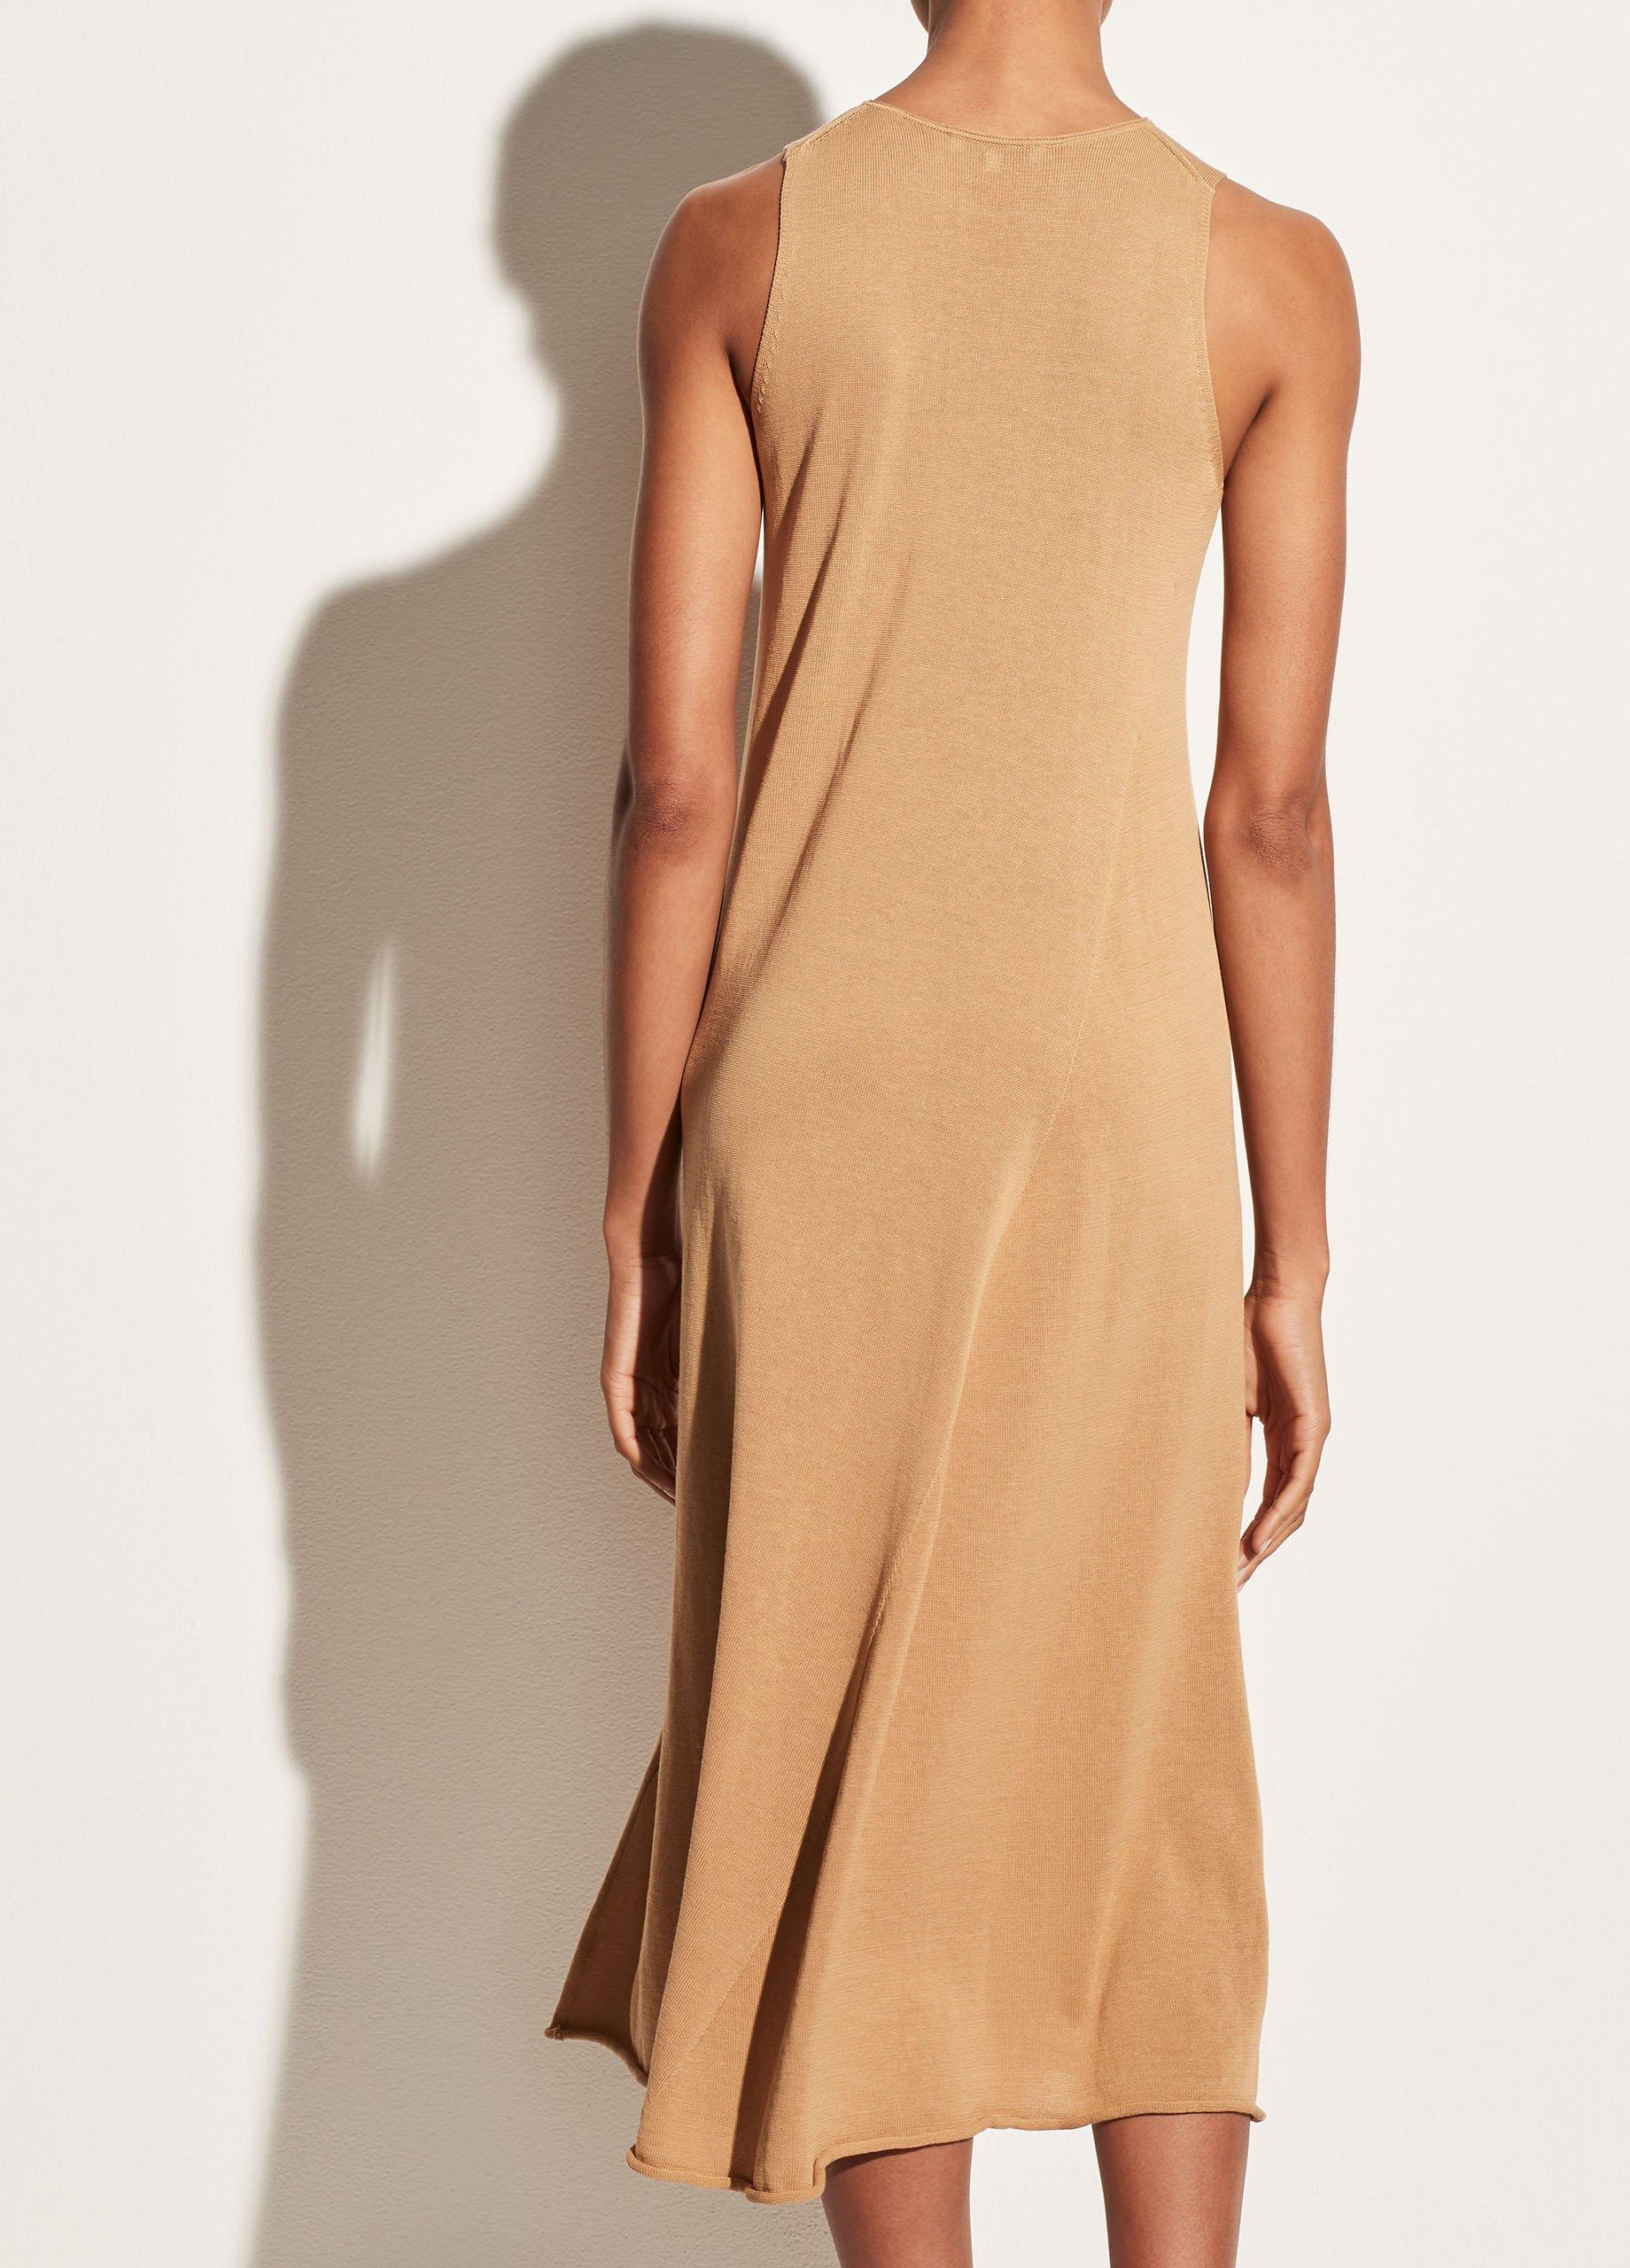 Shirred Tank Dress